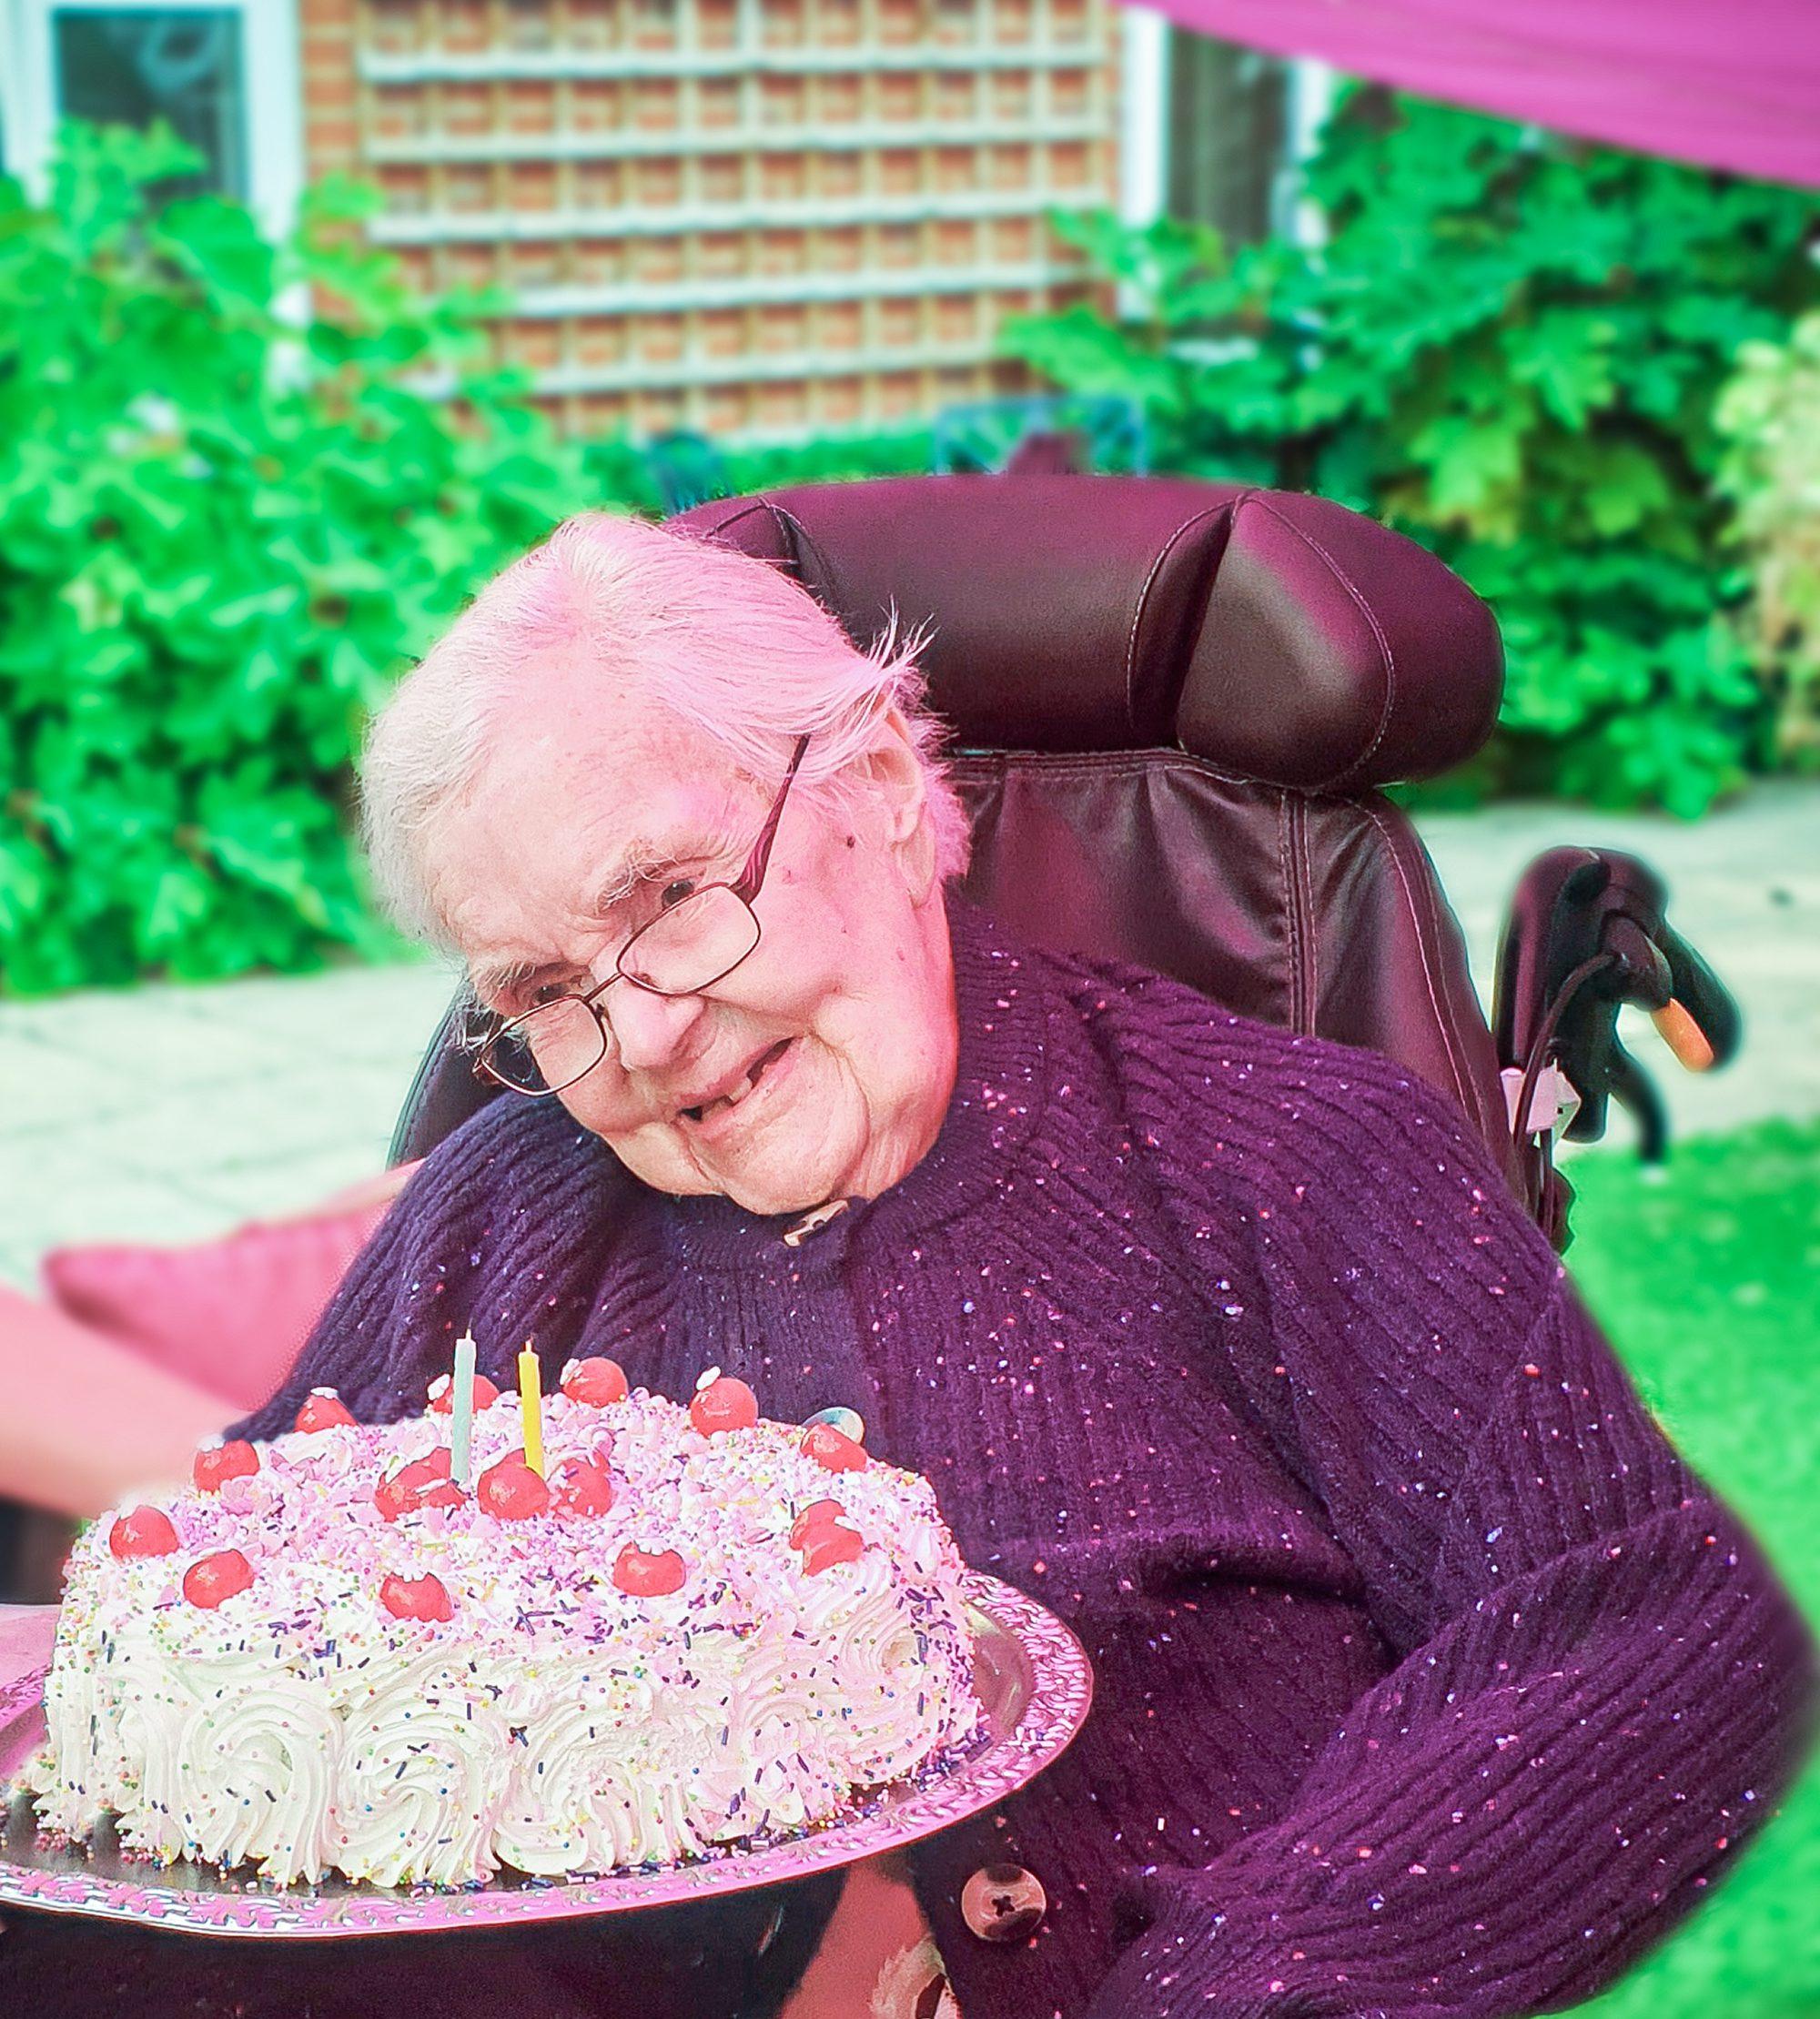 Moyra Webber on her birthday